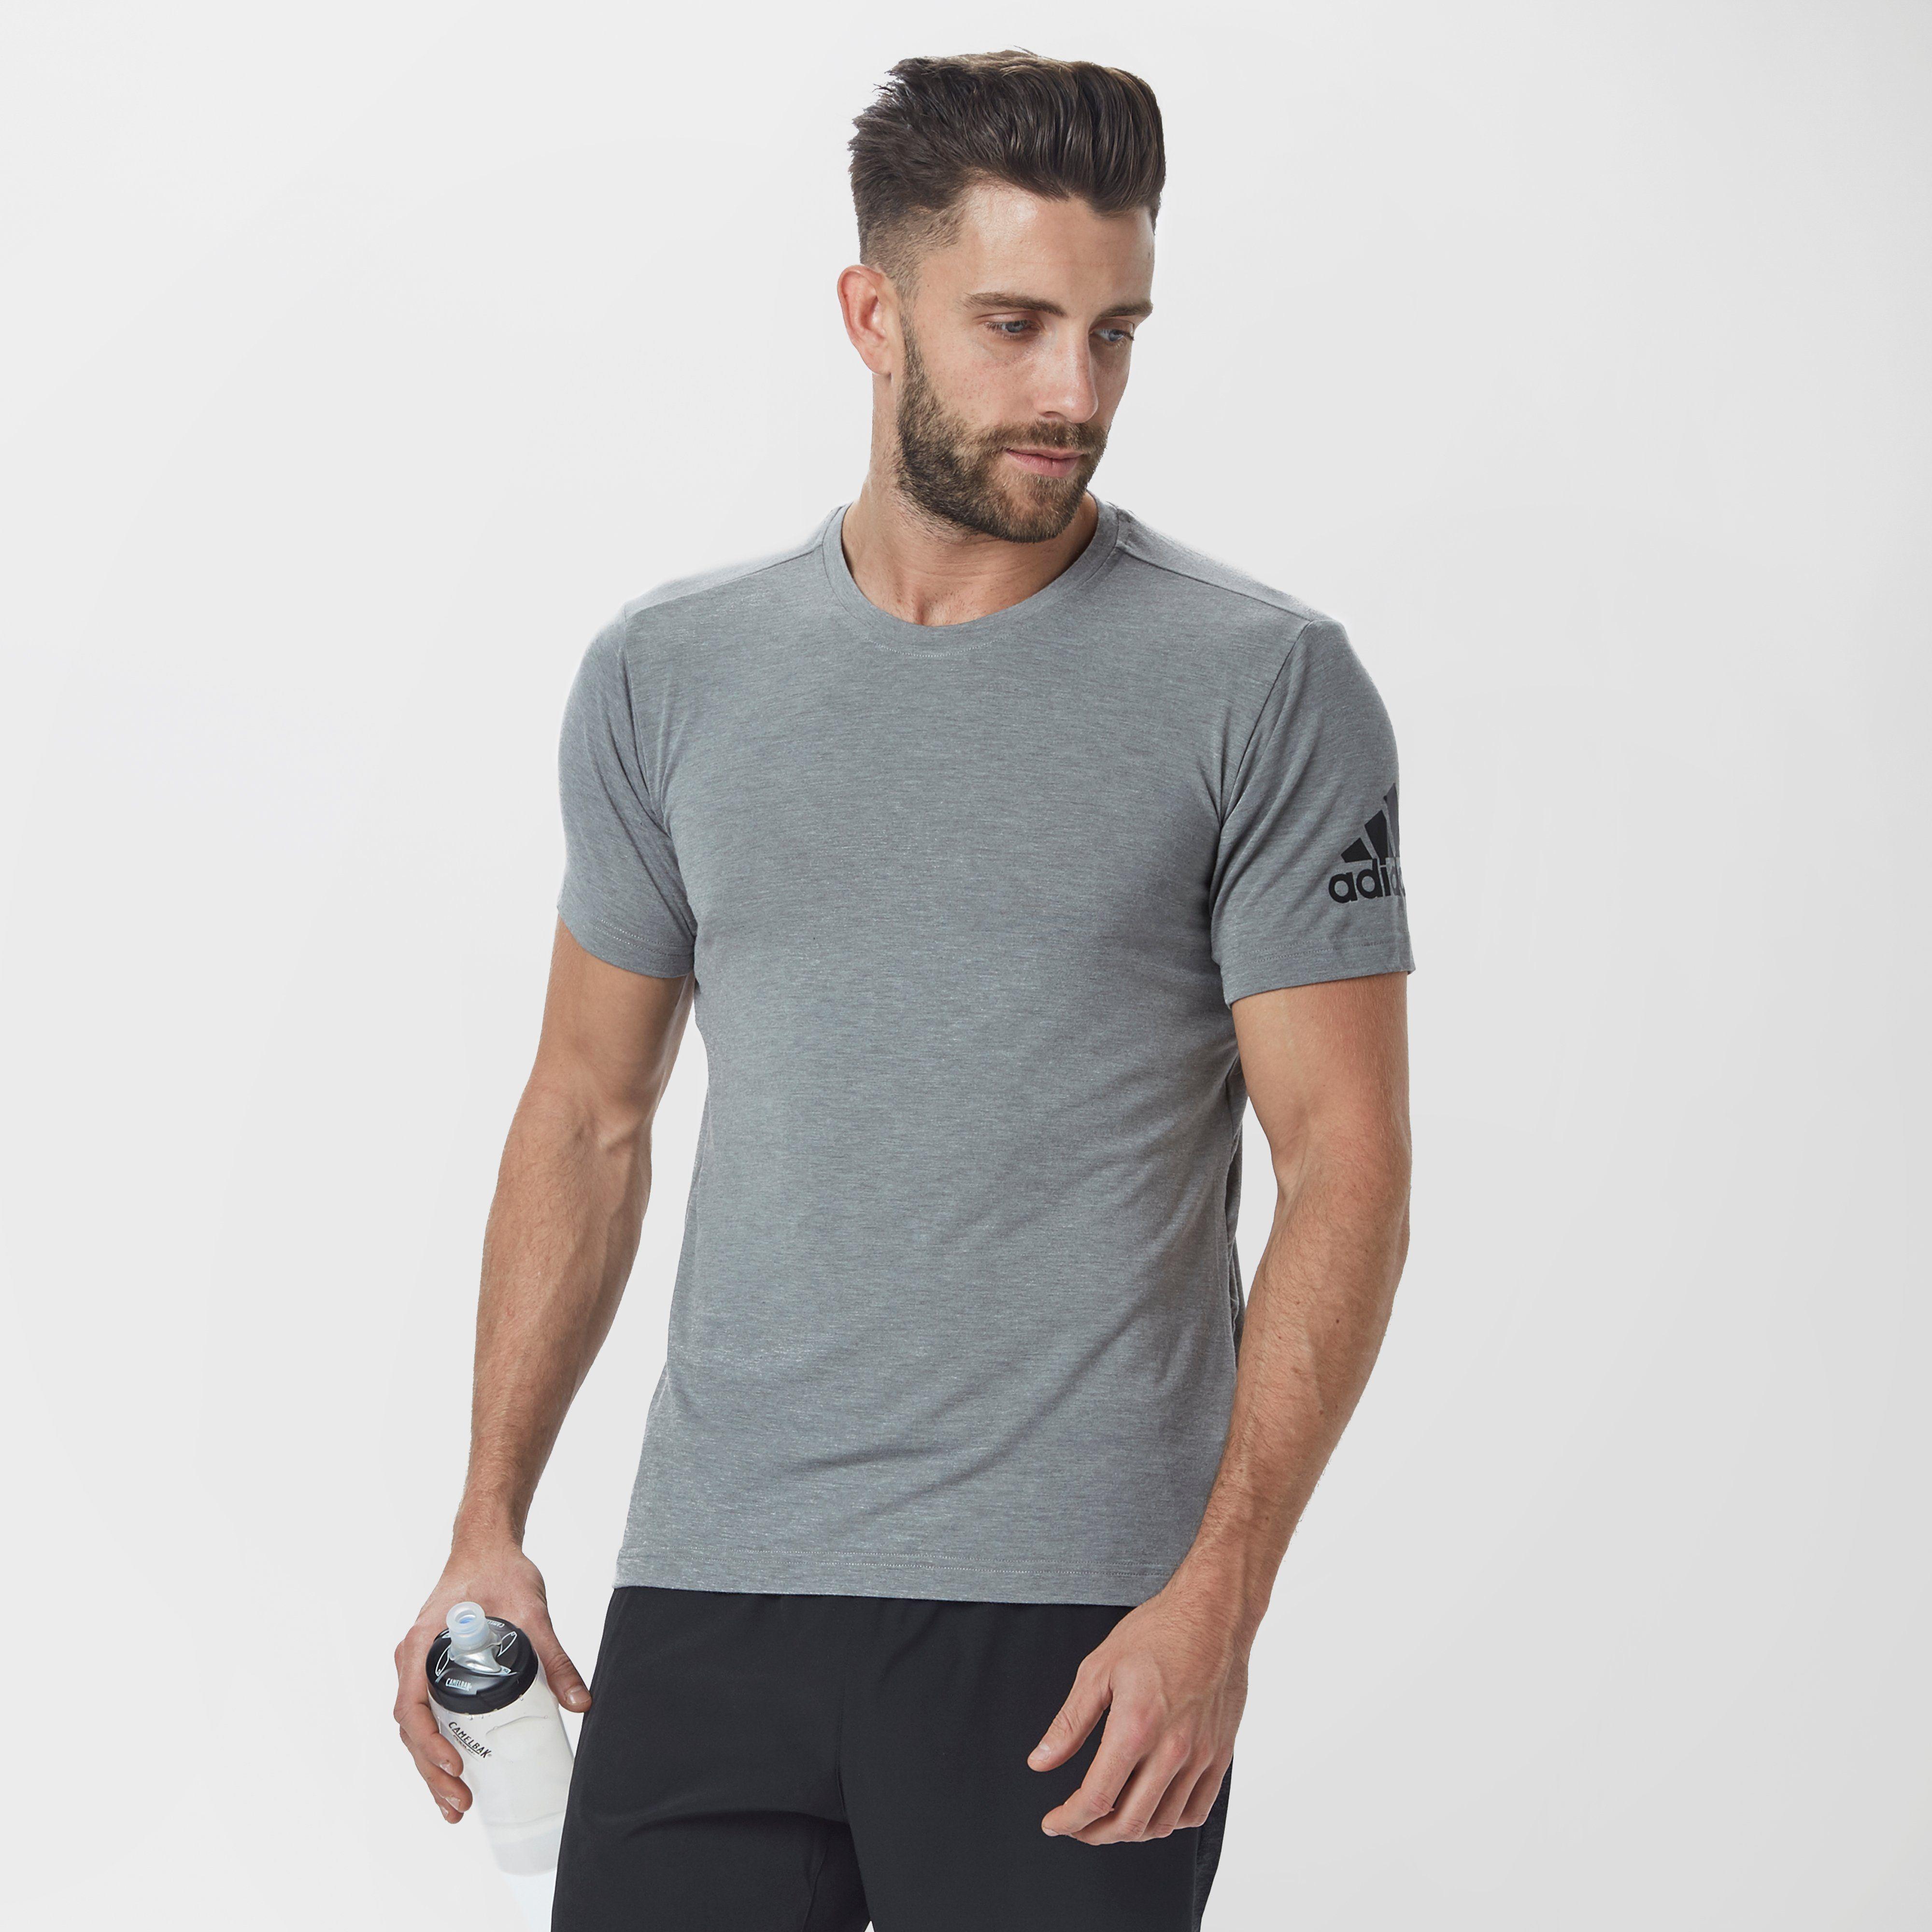 ADIDAS Men's Prime T-Shirt